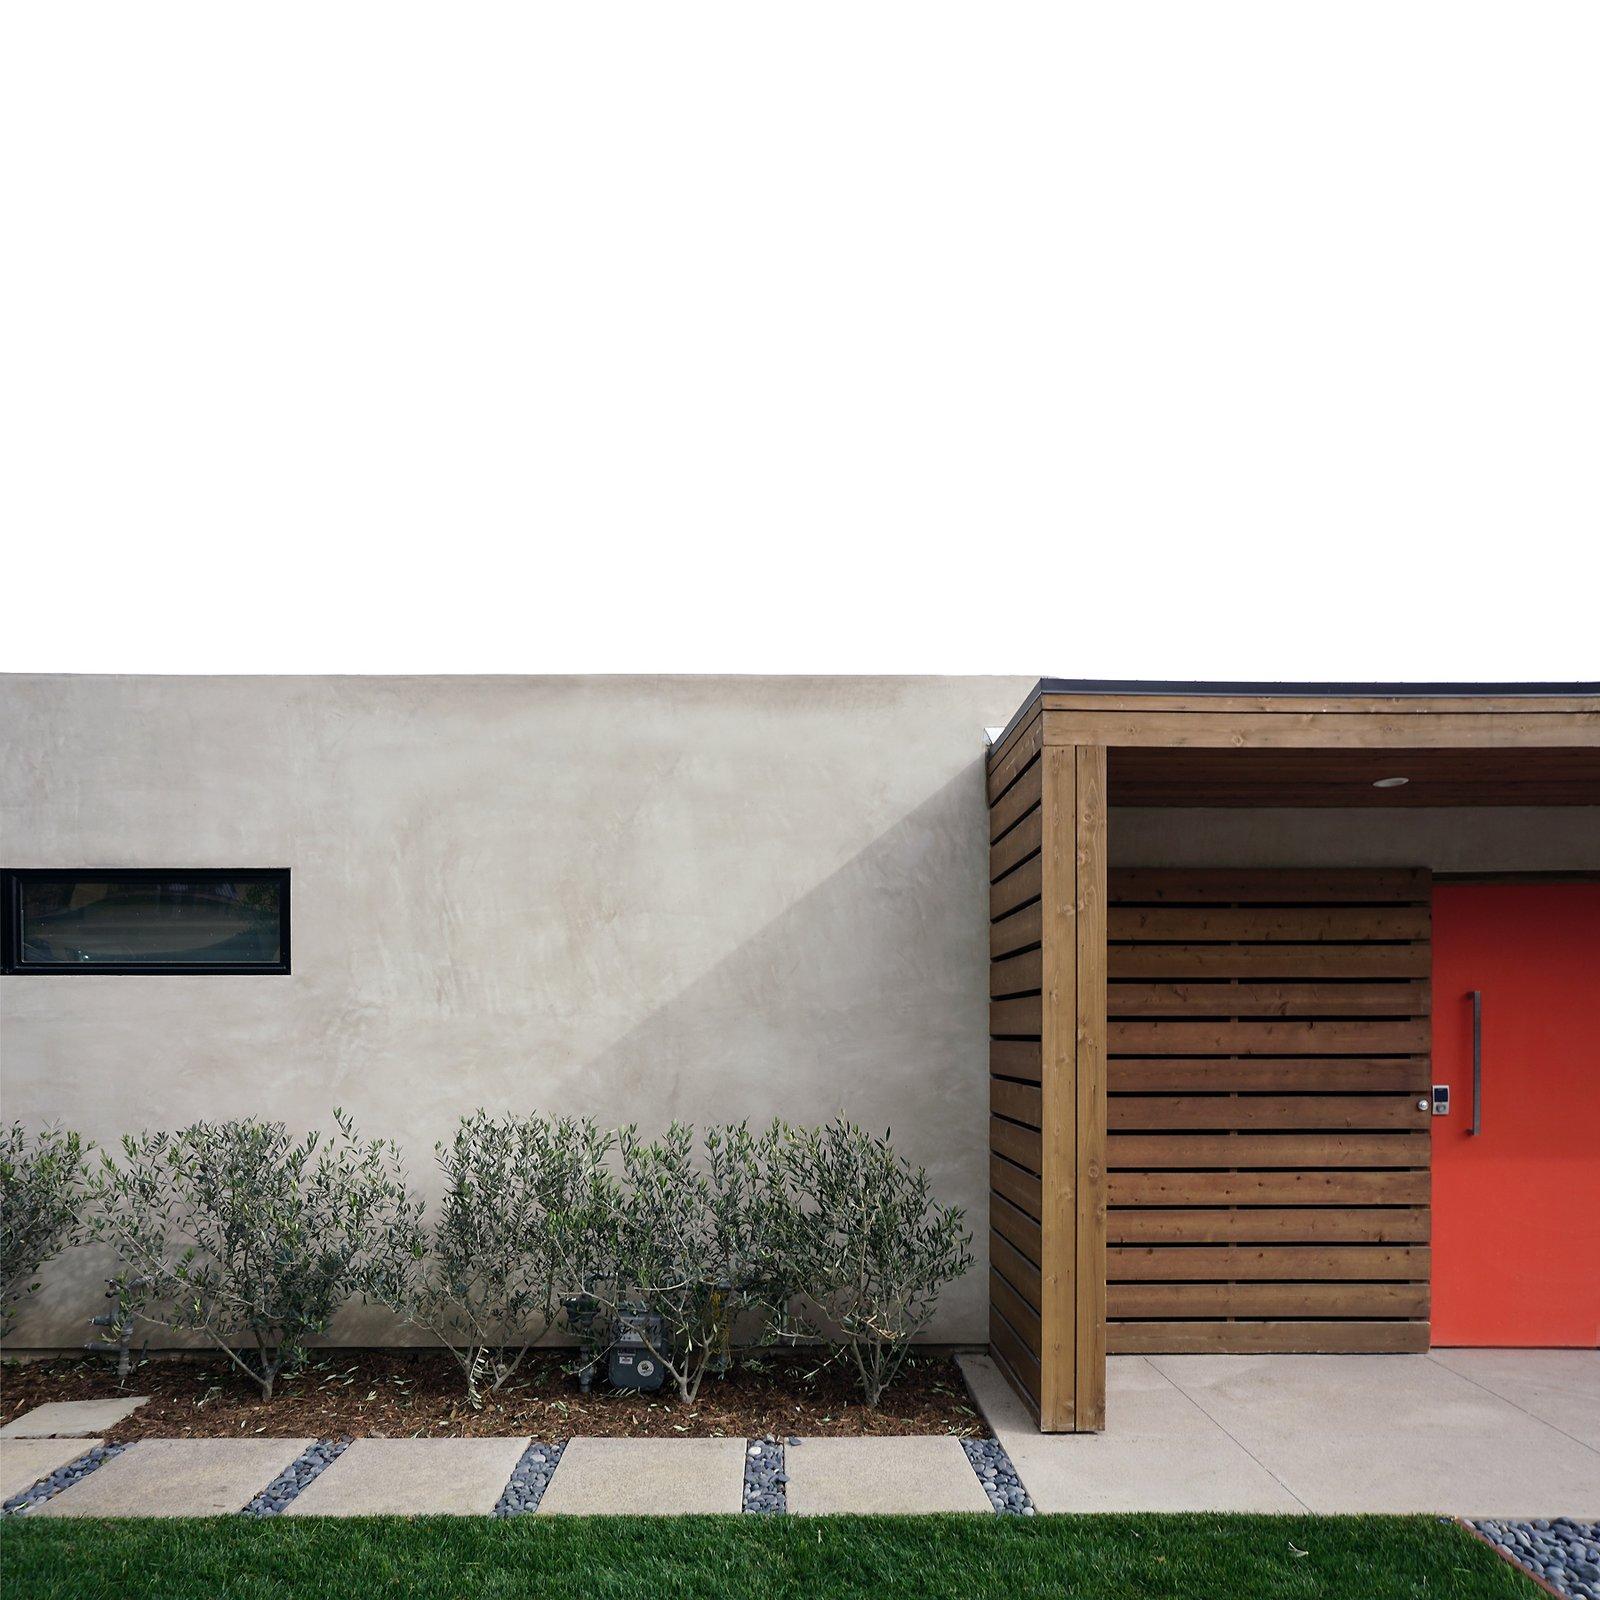 concrete, wood slats + smooth stucco at orange pivot door / exterior courtyard entry   [midcentury modern renovation / laguna niguel, california]   Office from Mid century modern